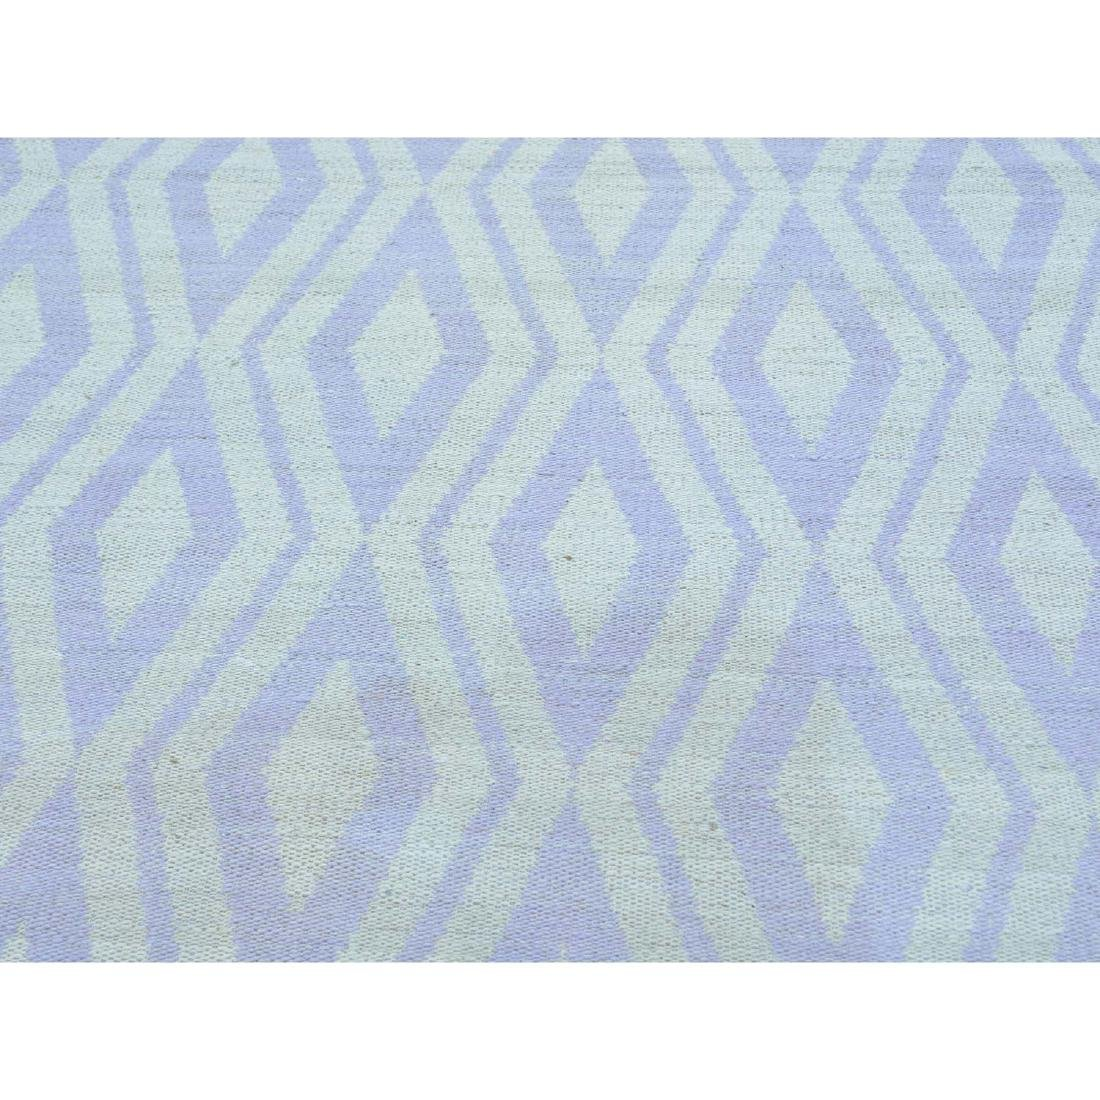 Ivory Flat Weave Hand Woven Reversible Kilim Rug - 4